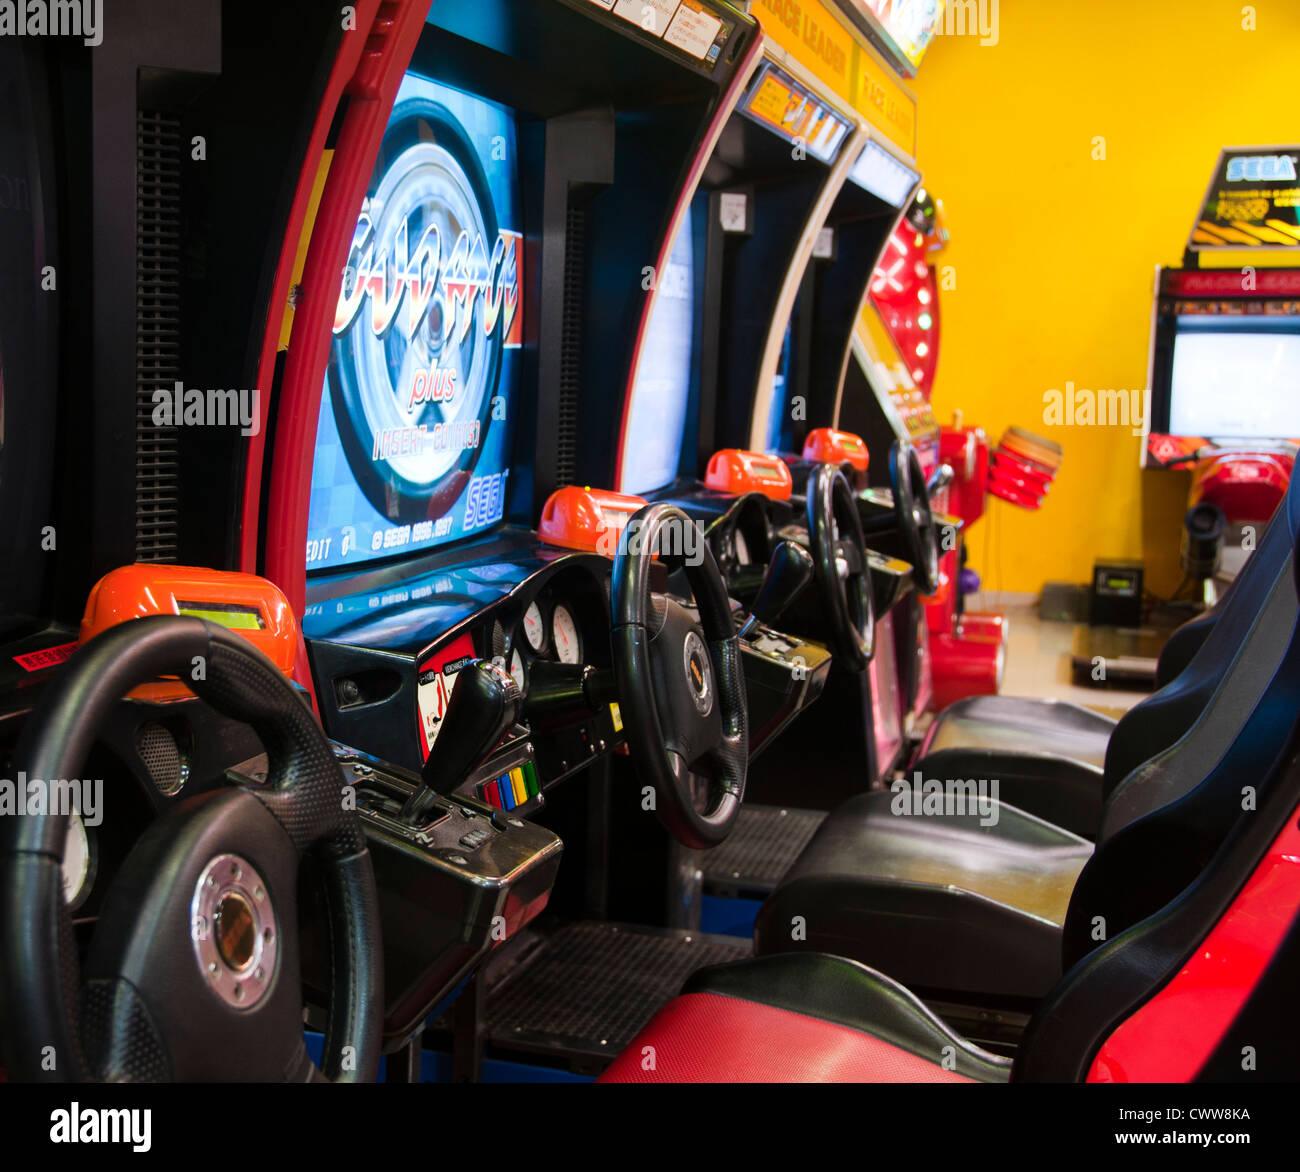 Arcade Racing Game - Stock Image